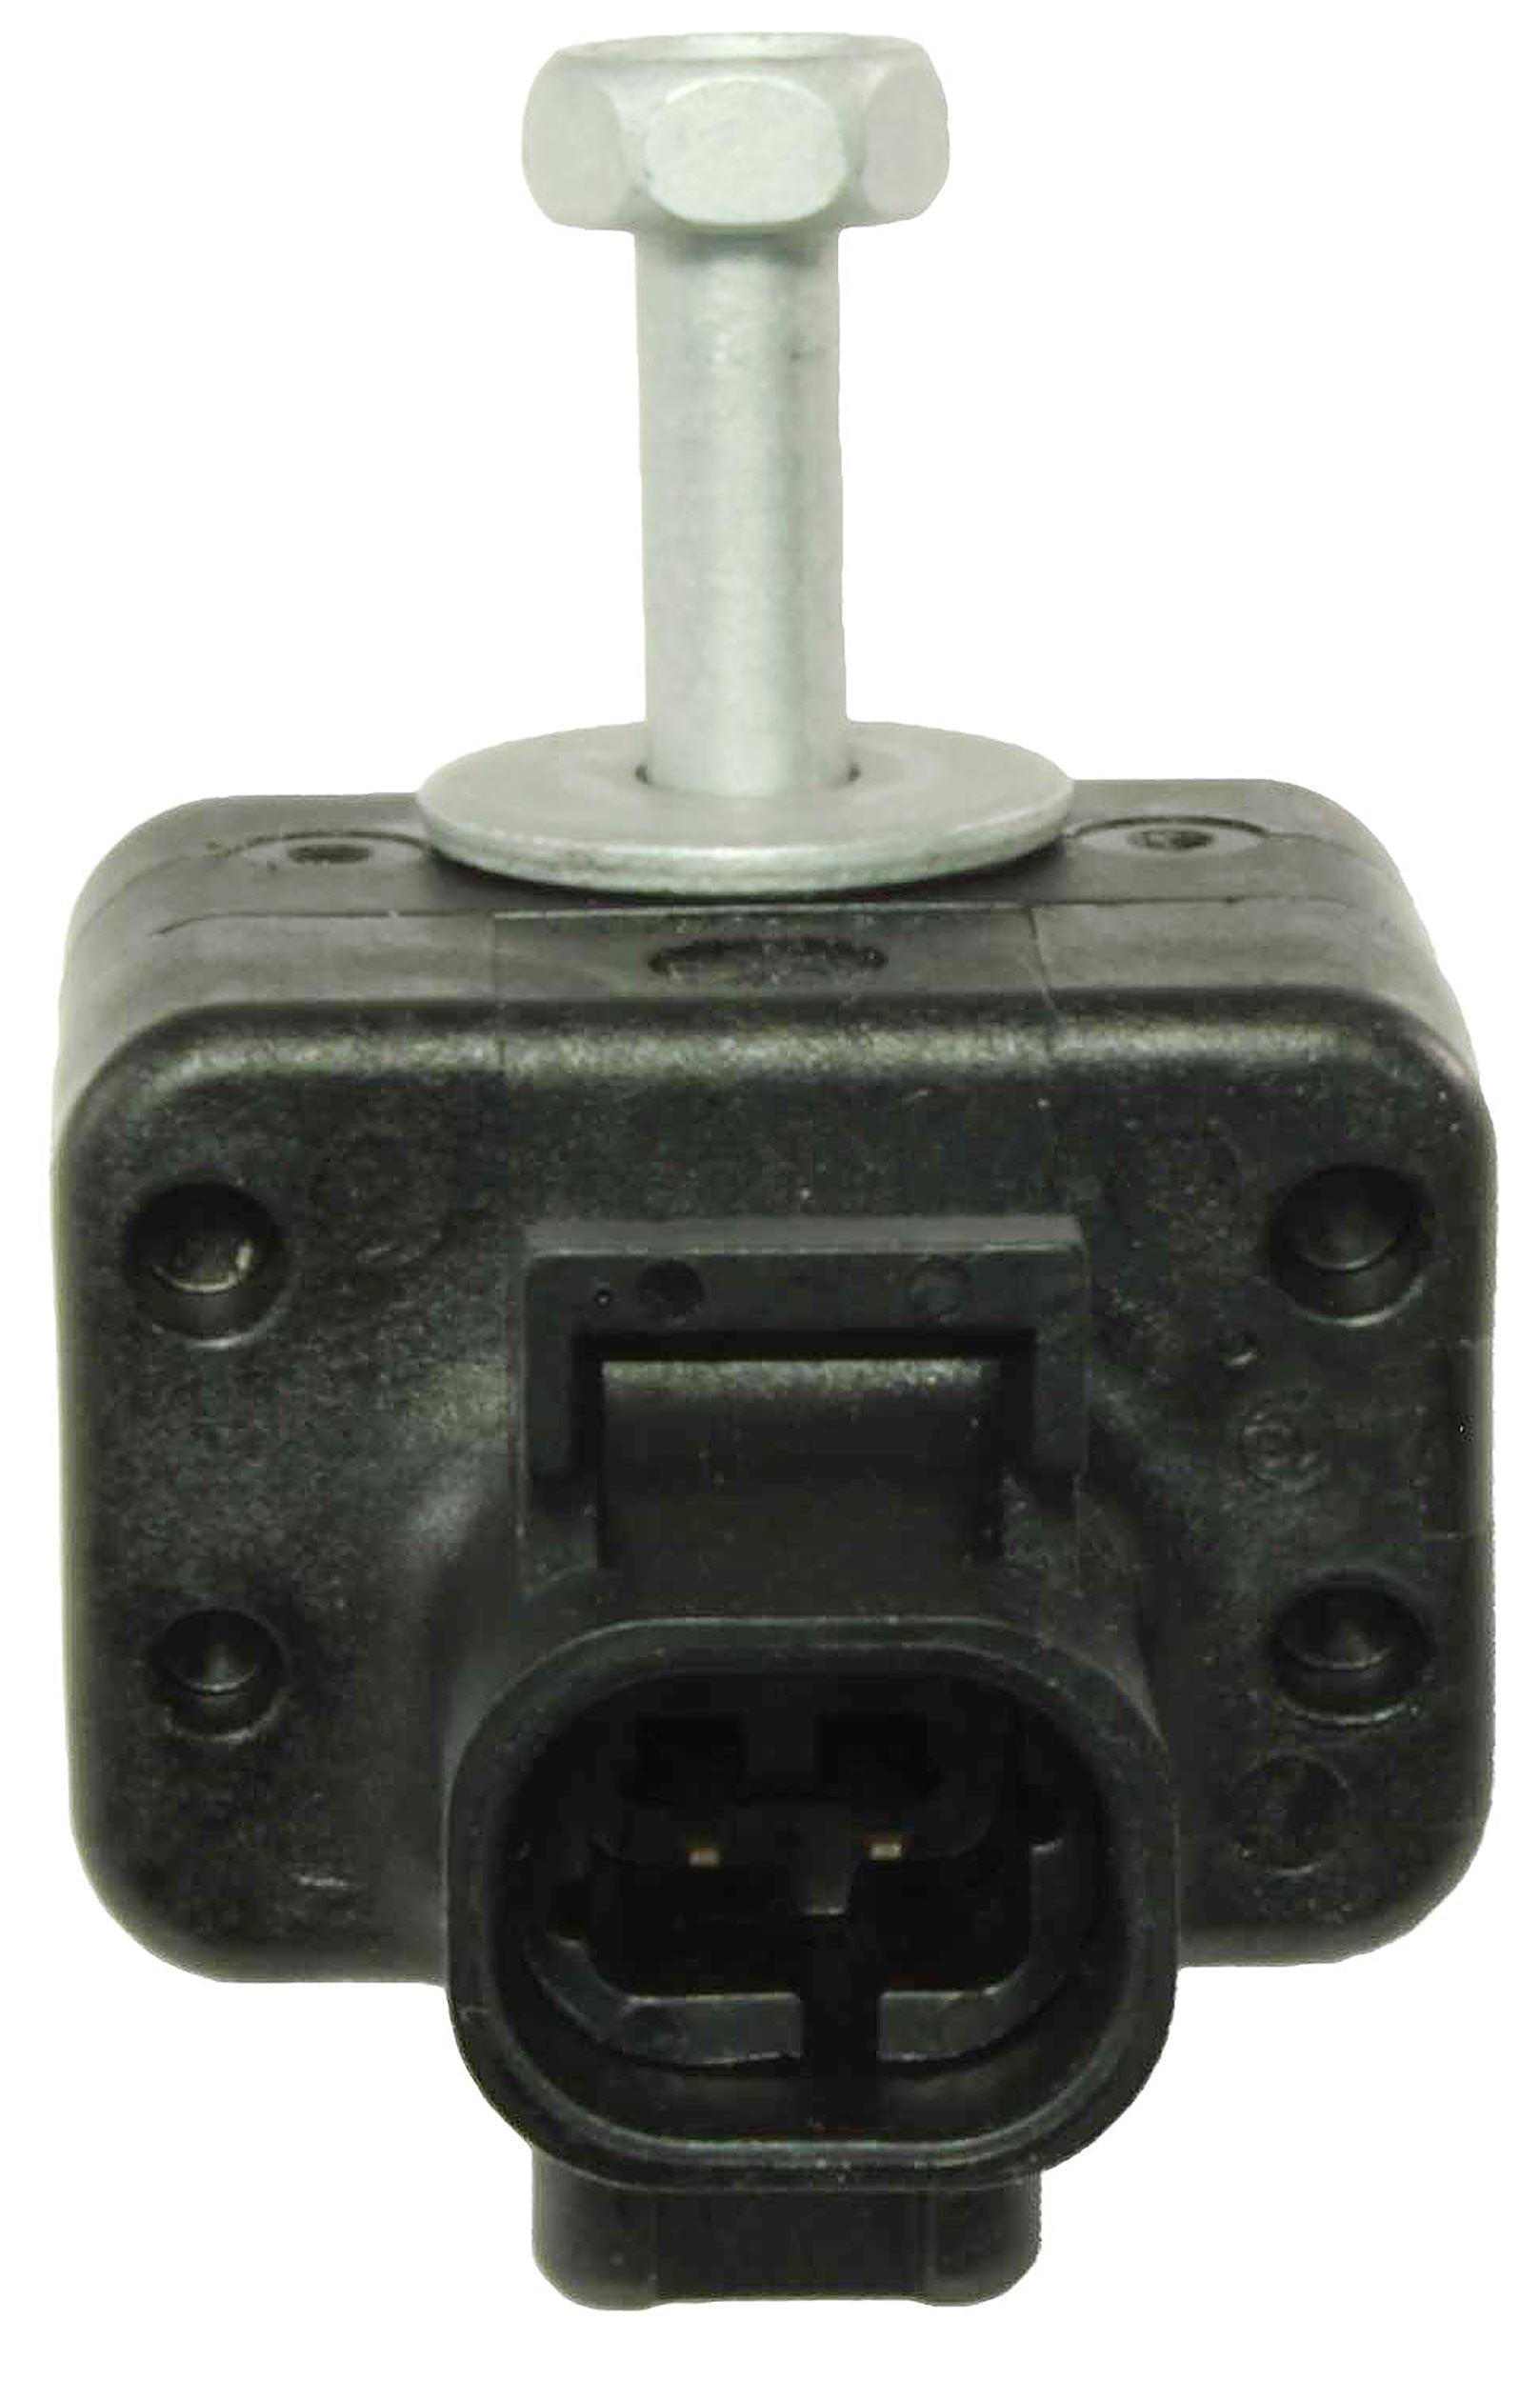 Cheap Front Airbag Sensor, find Front Airbag Sensor deals on line at